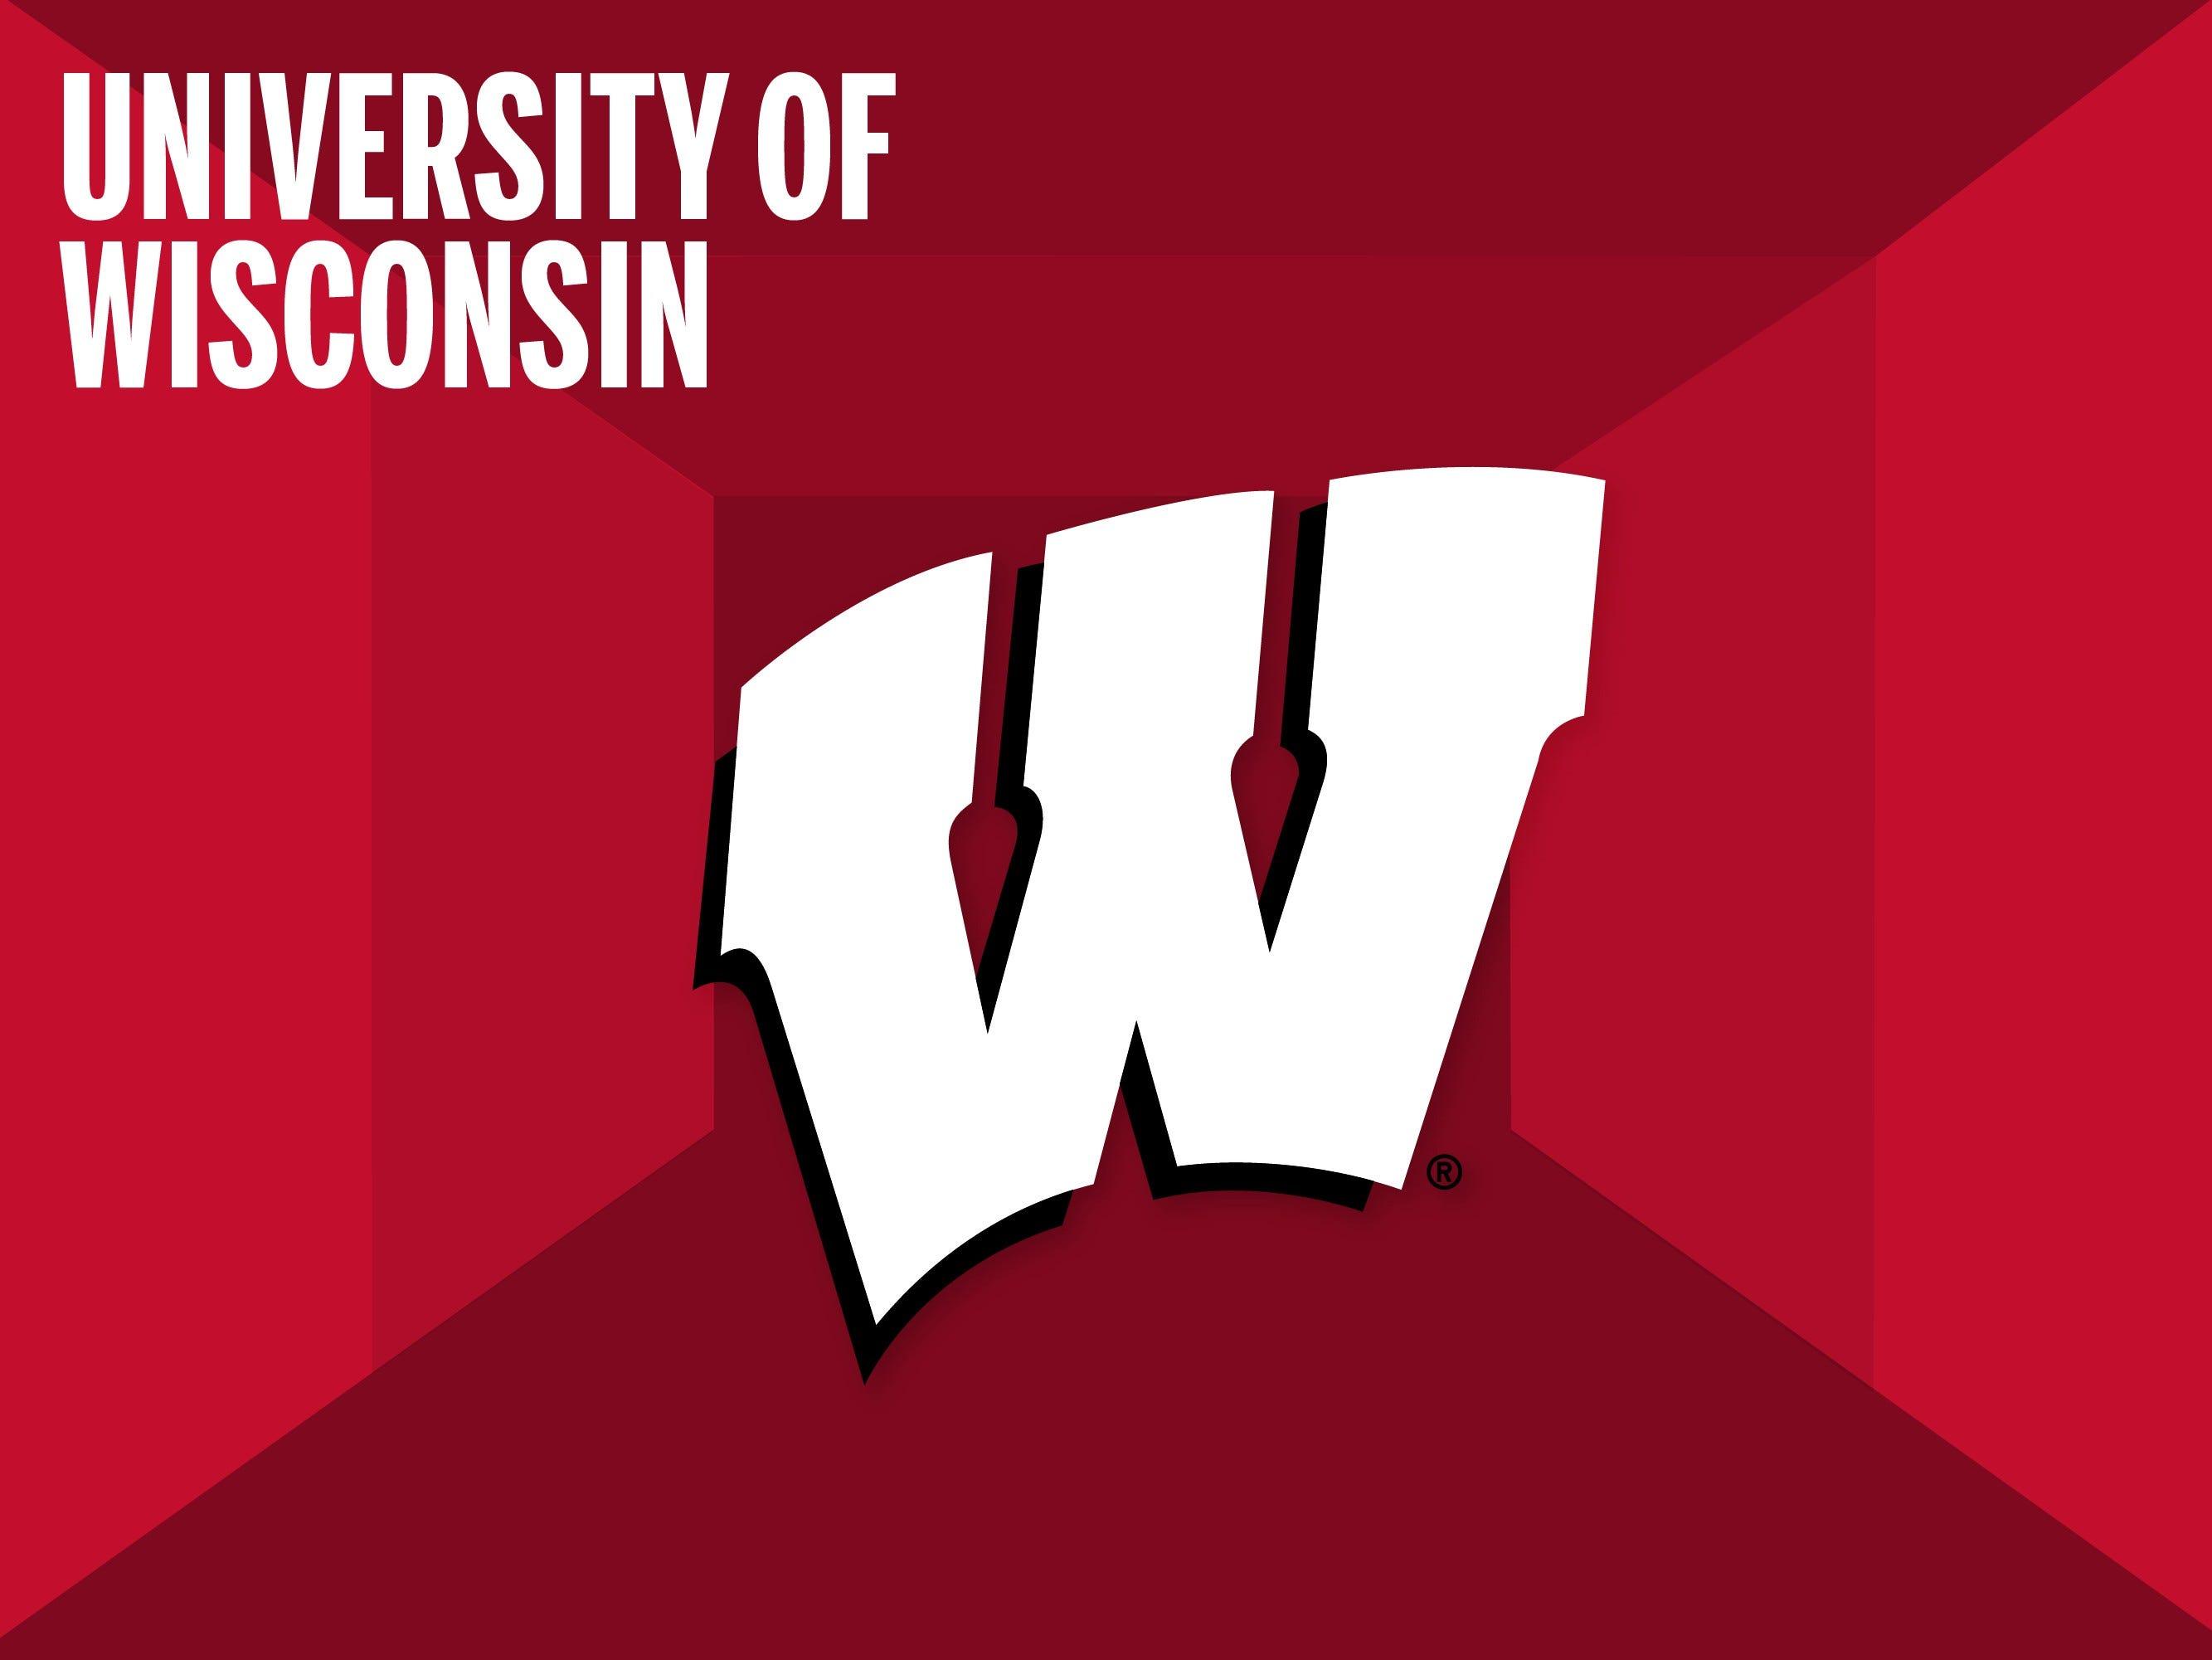 University of Wisconsin College Football Shop